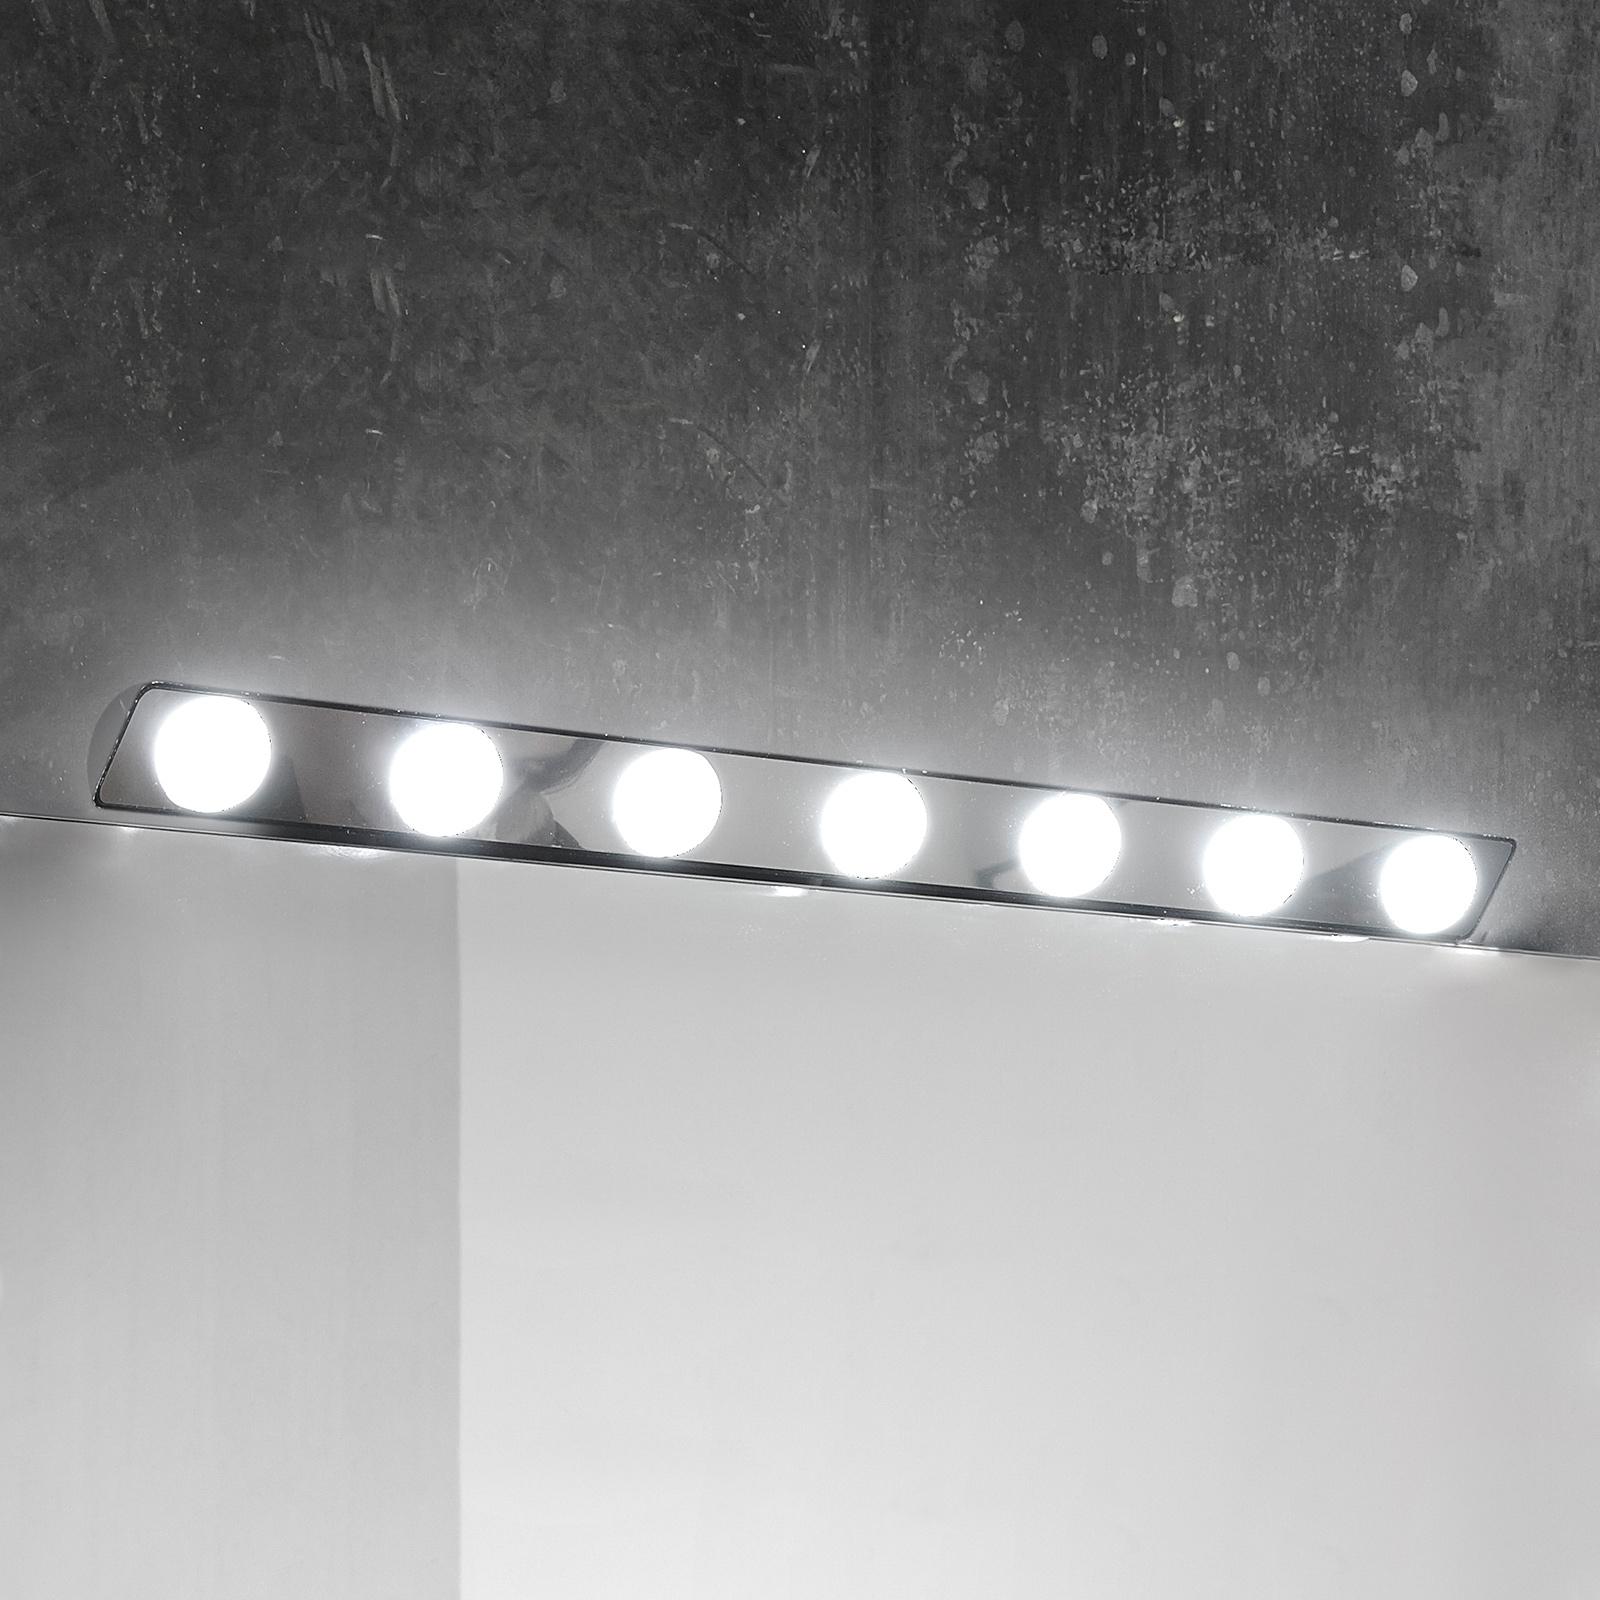 LED-speillampe Hollywood, 85cm 7 lyskilder.